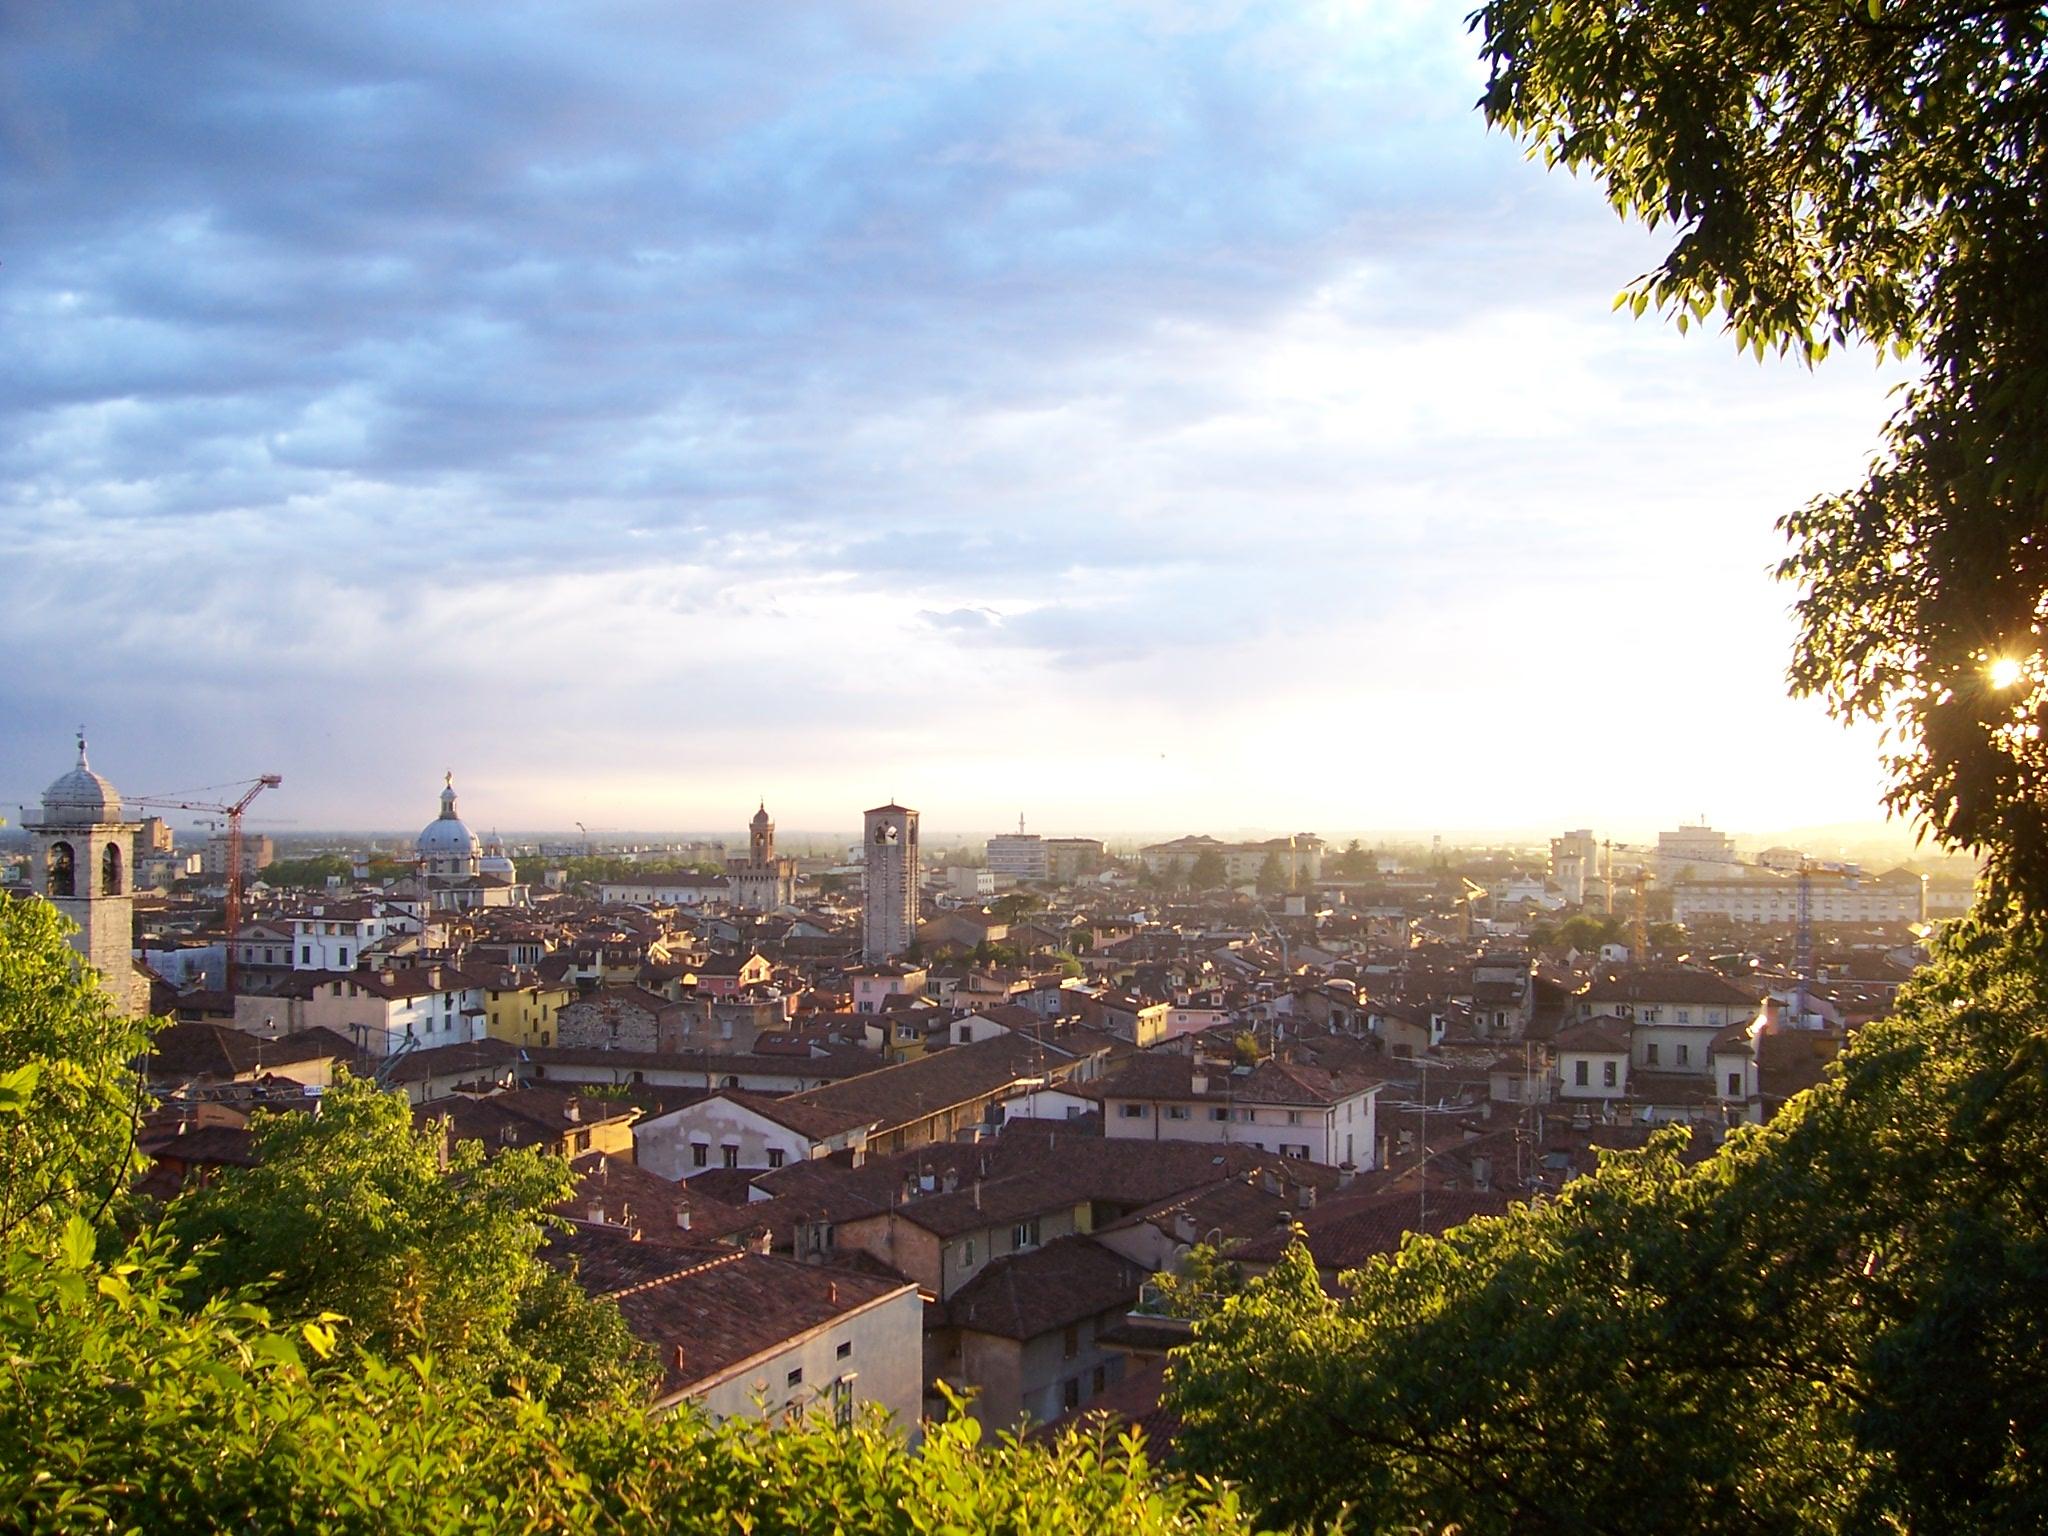 leopoli brescia italy - photo#16